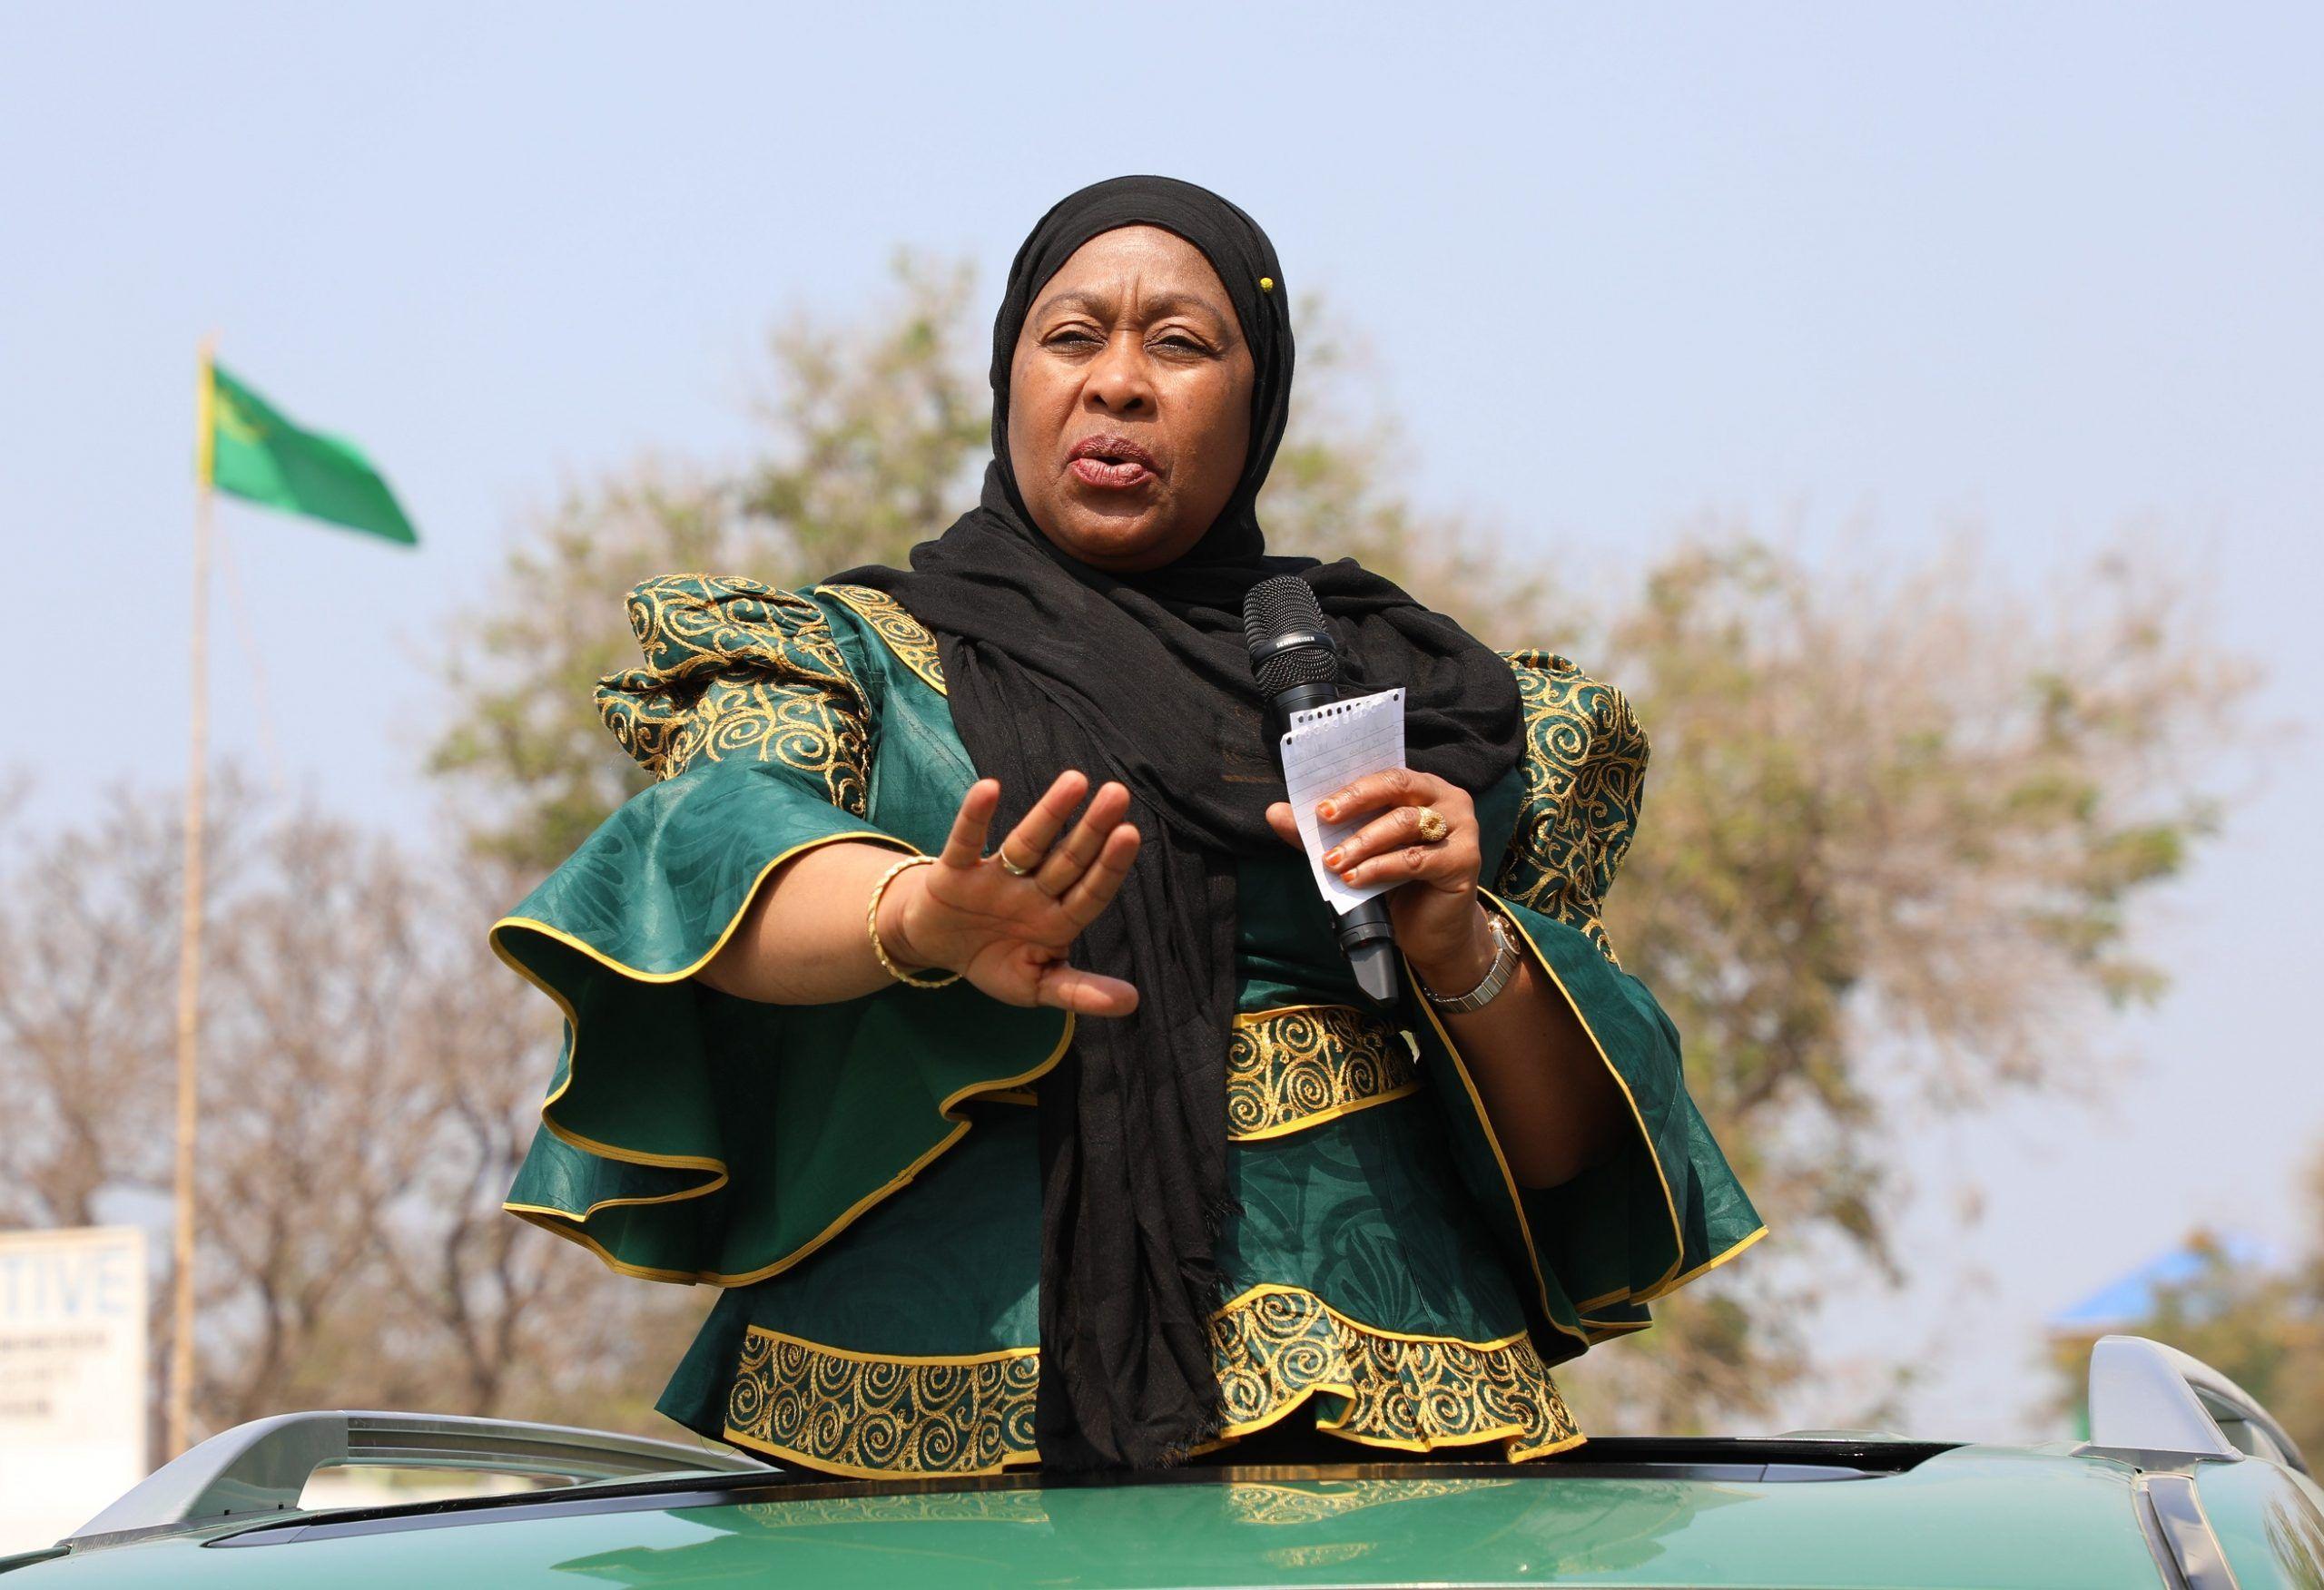 Samia Suluhu Hassan    First Female President of Tanzania